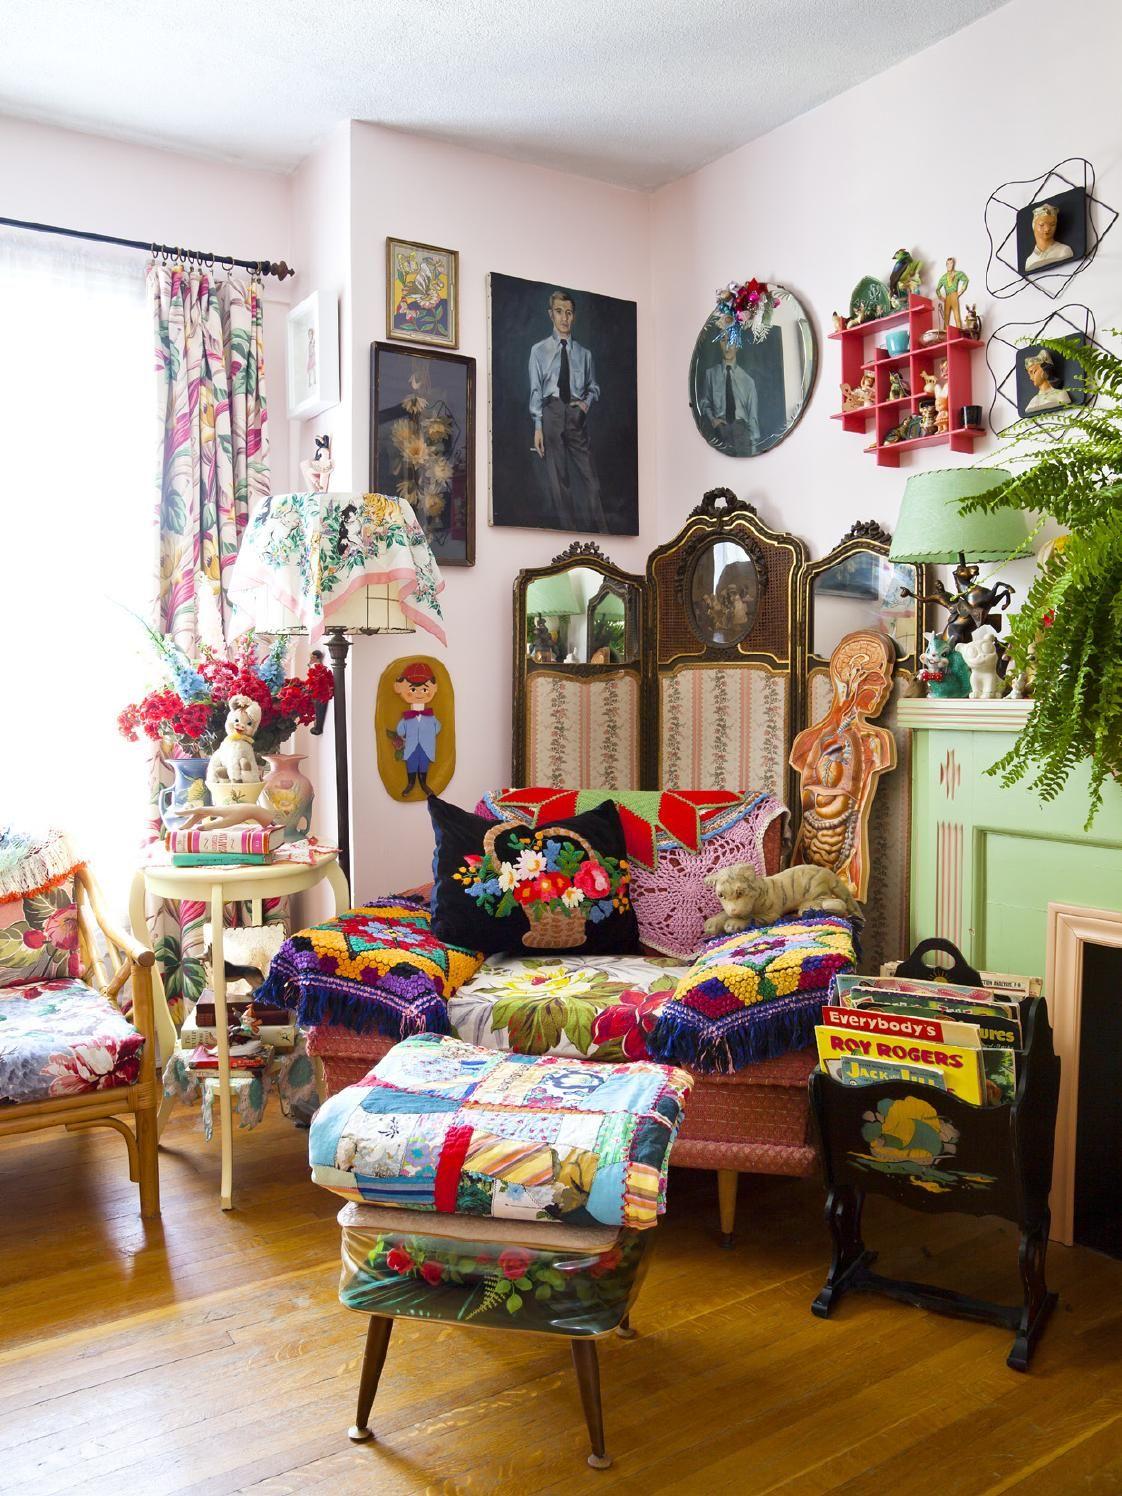 issuu issue26 de covet garden boho living room eclectic home maximalist decor on boho chic decor living room bohemian kitchen id=75481